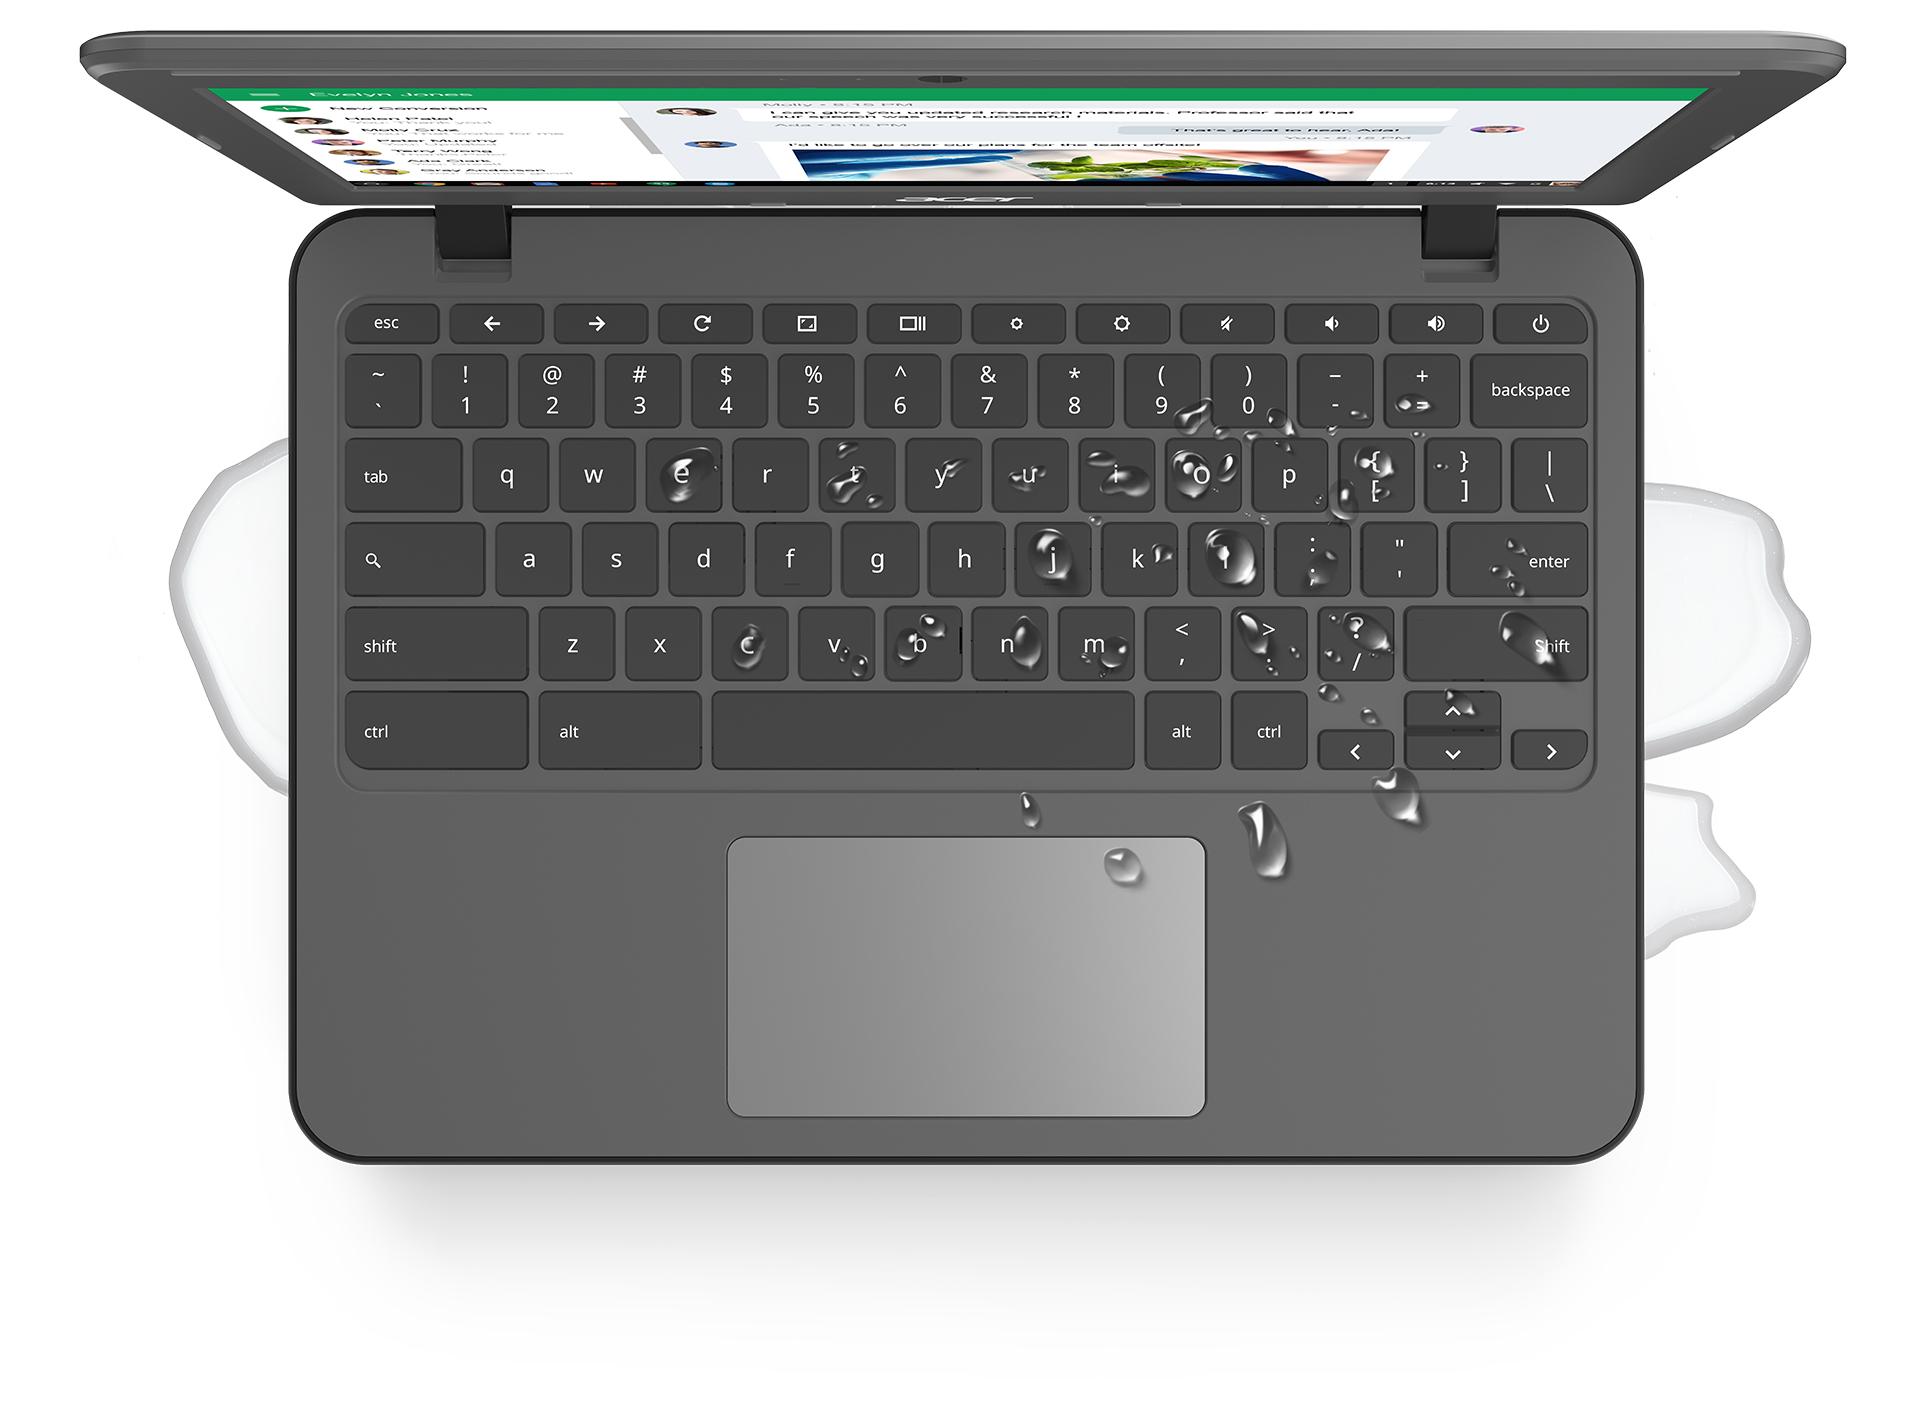 Chromebook 11 N7 - Spill Resistant Keyboard - Large